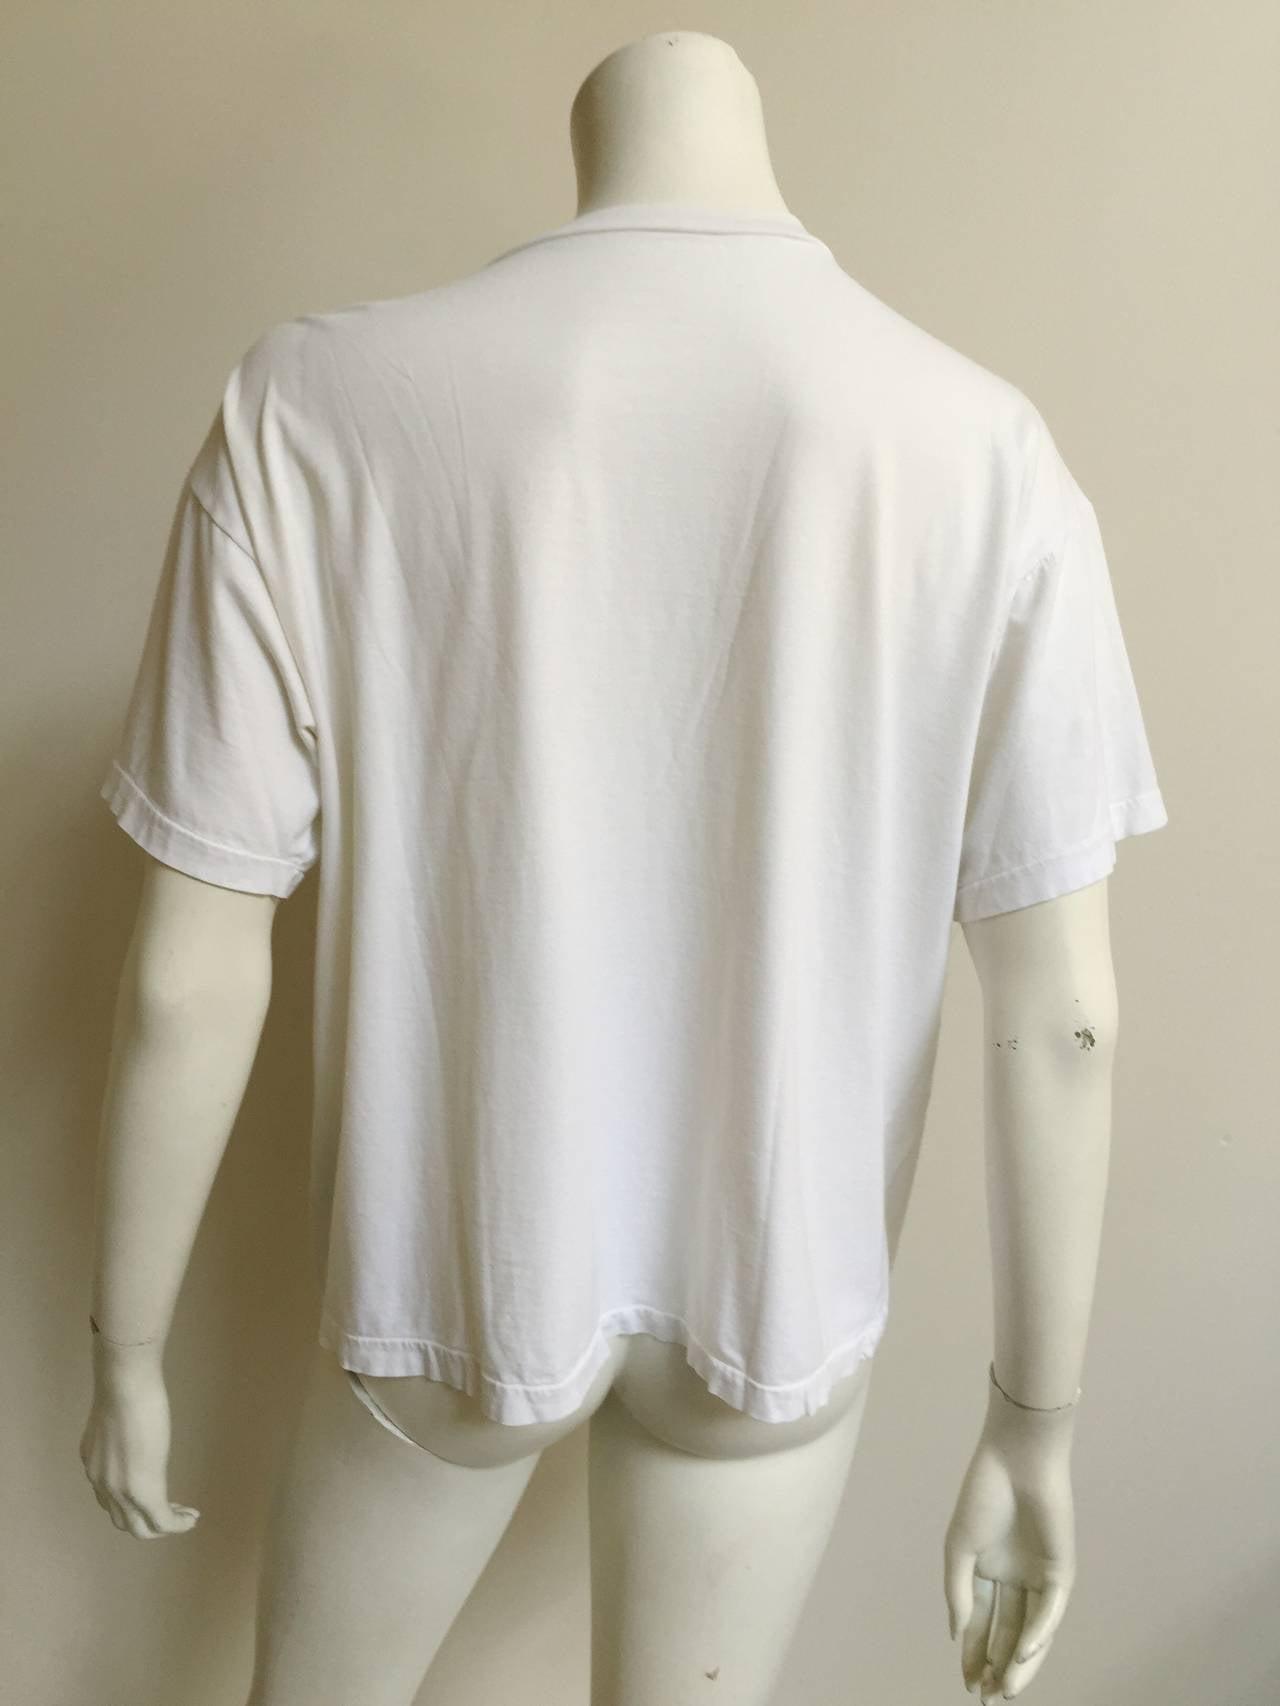 Patrick Kelly 1988 'Mississippi Lisa' t-shirt . 5